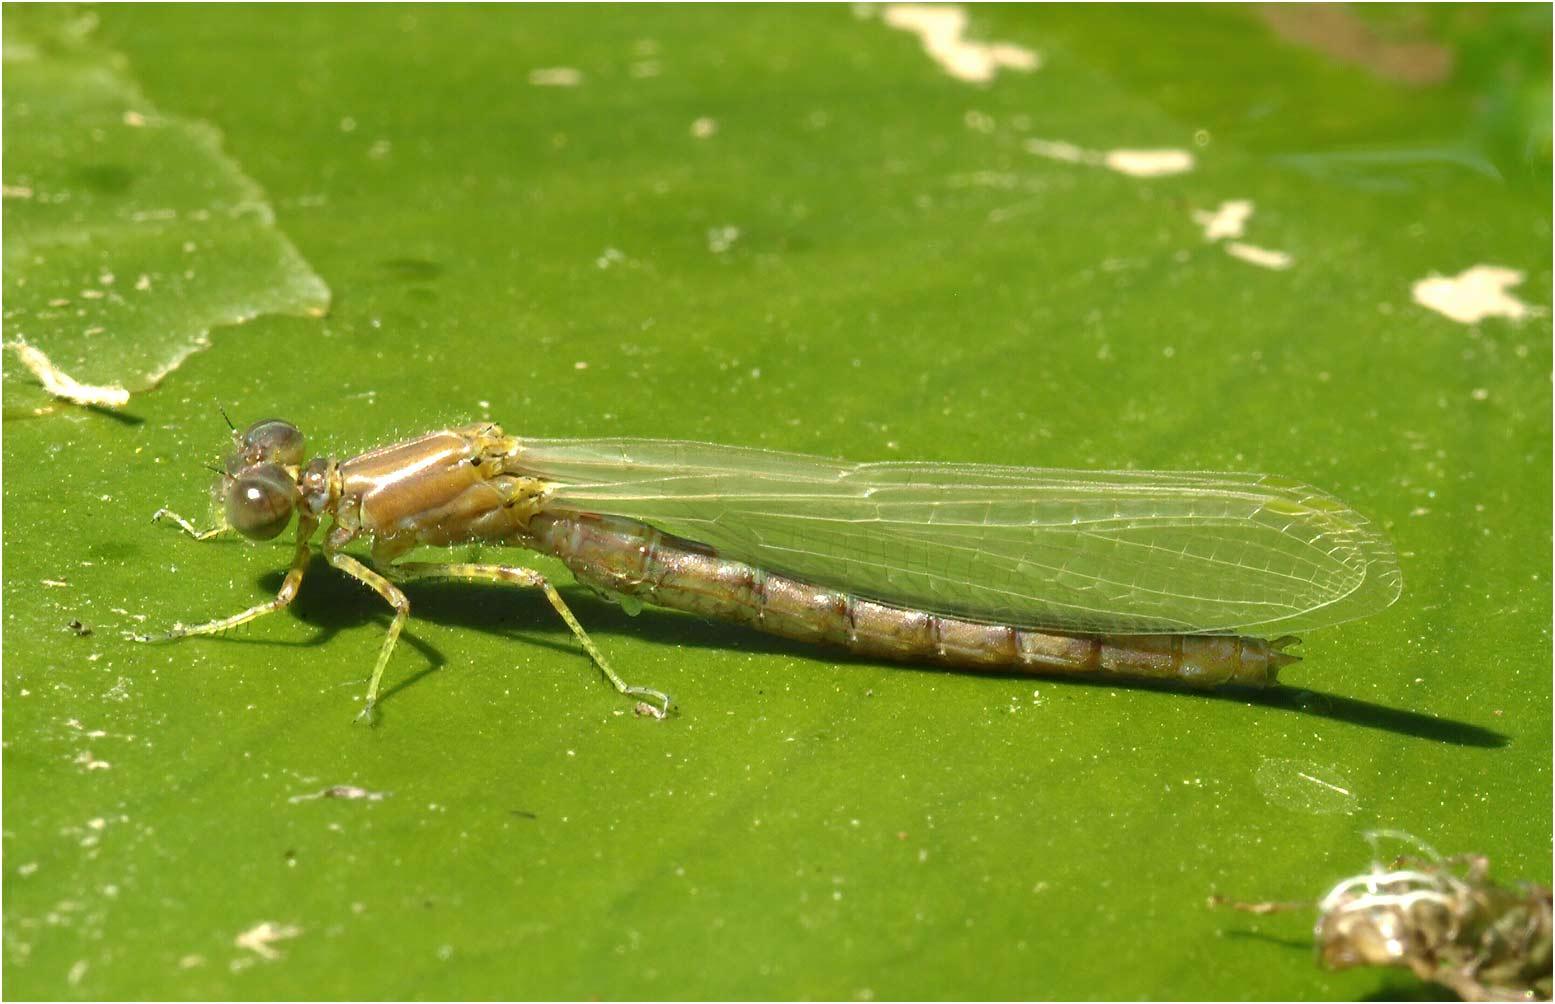 Erythromma lindenii mâle en émergence, Le Fief Sauvin (France-49), 23/05/2010